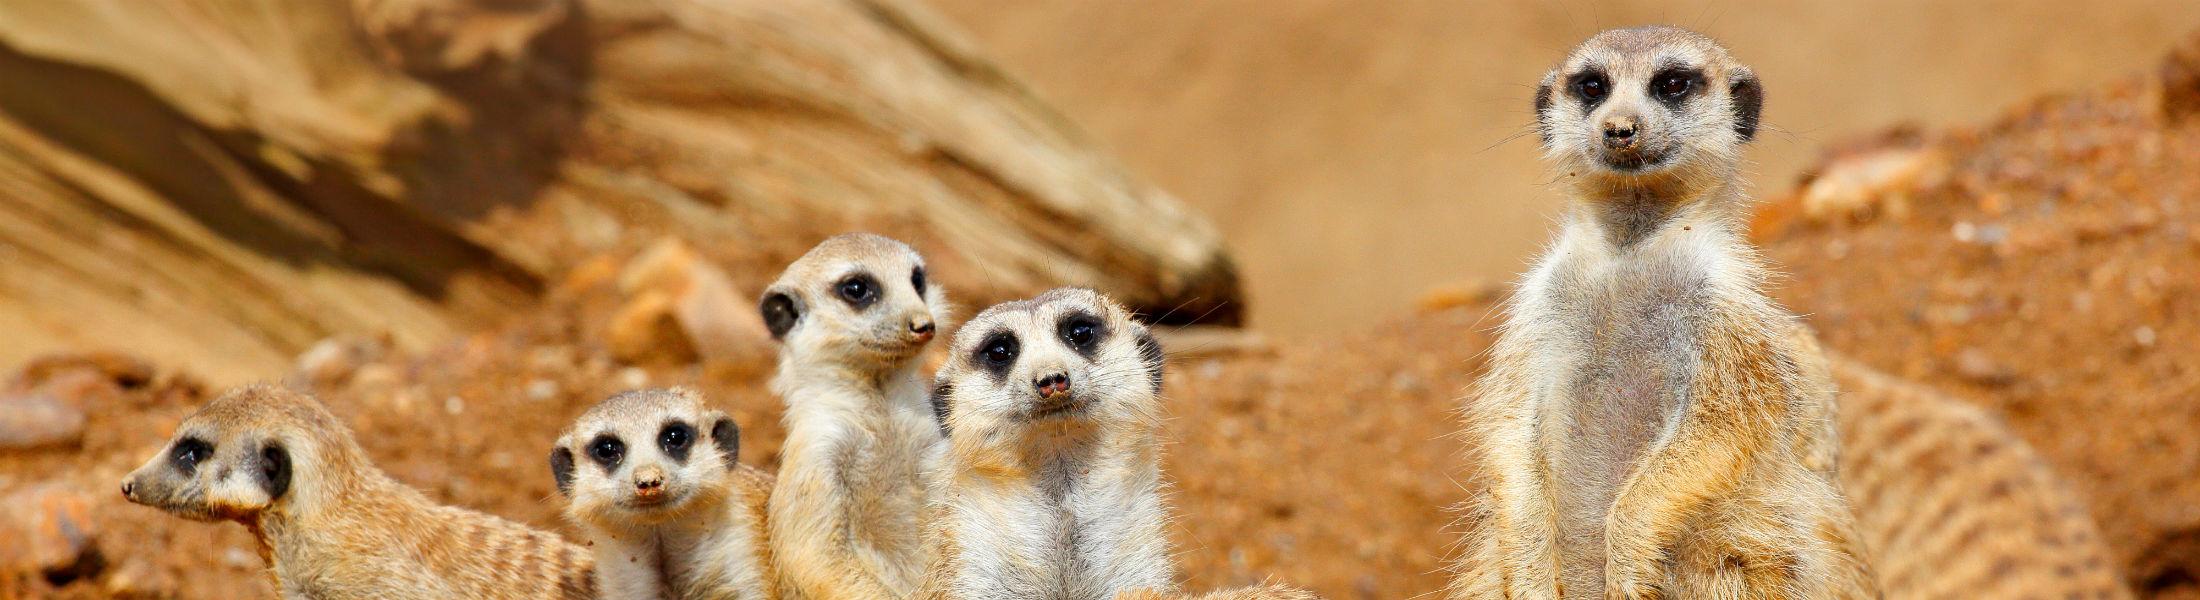 Meerkat family seen on a beach & safari holiday